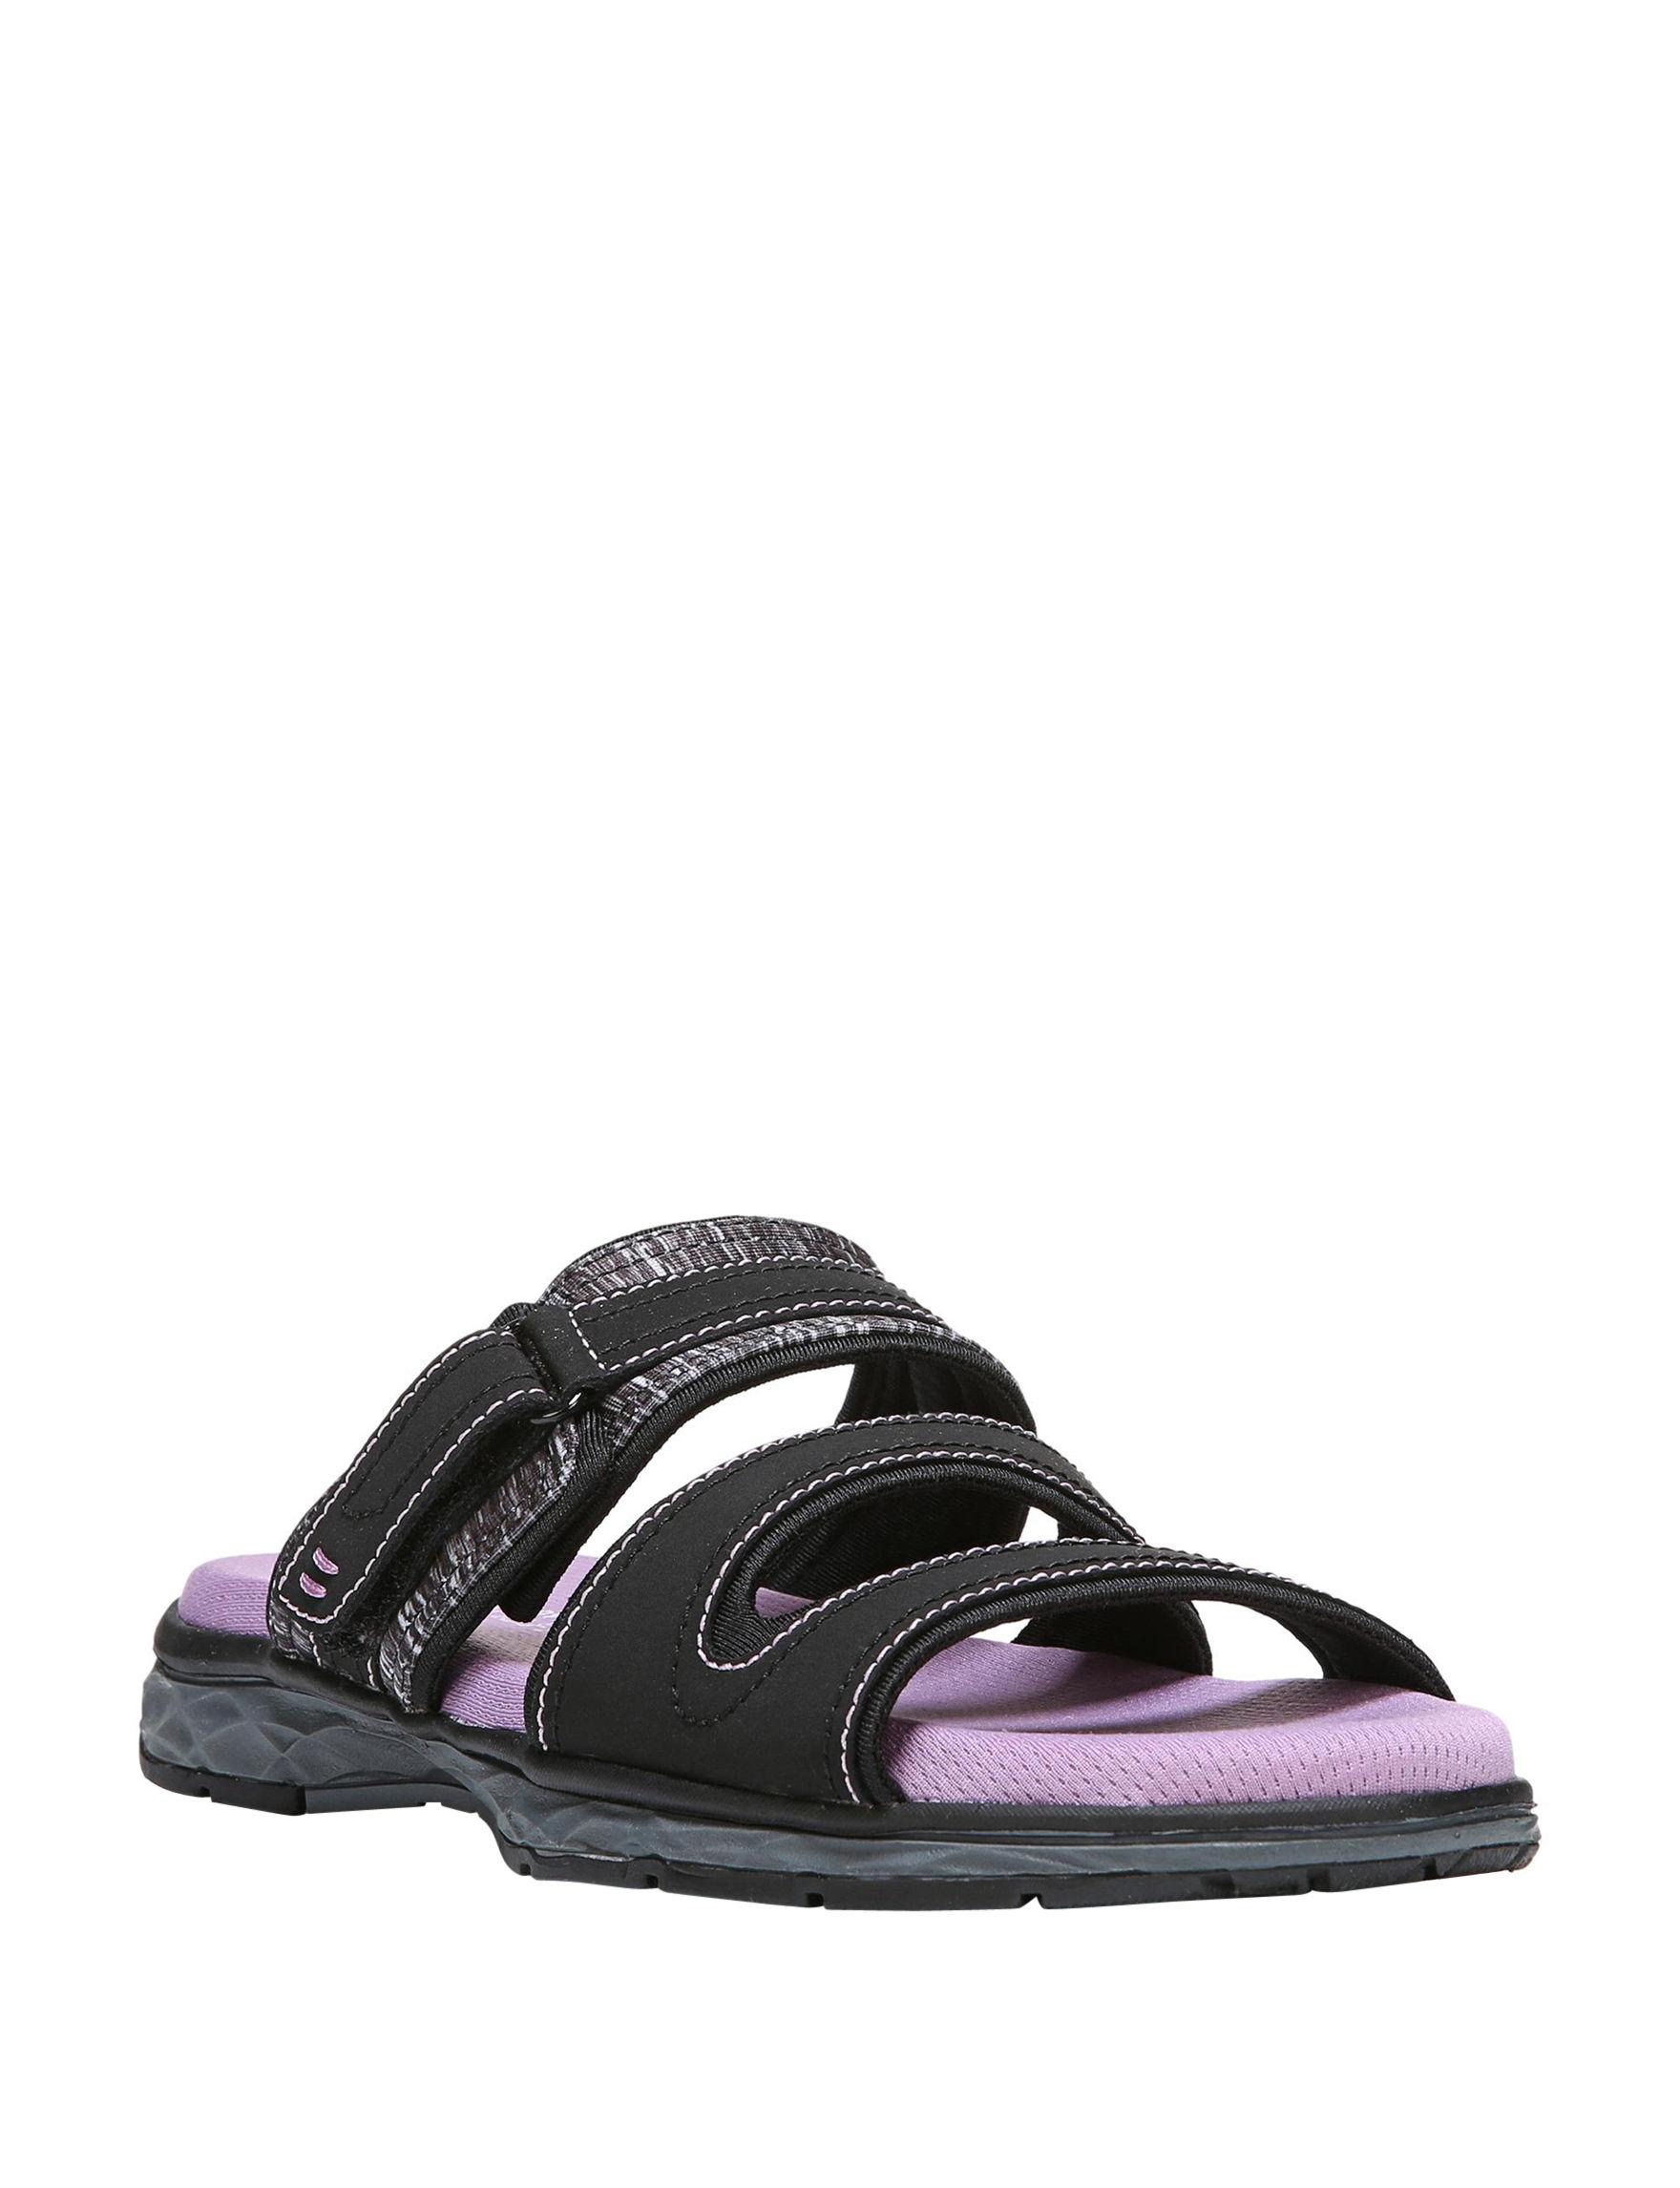 Dr. Scholl's Black Sport Sandals